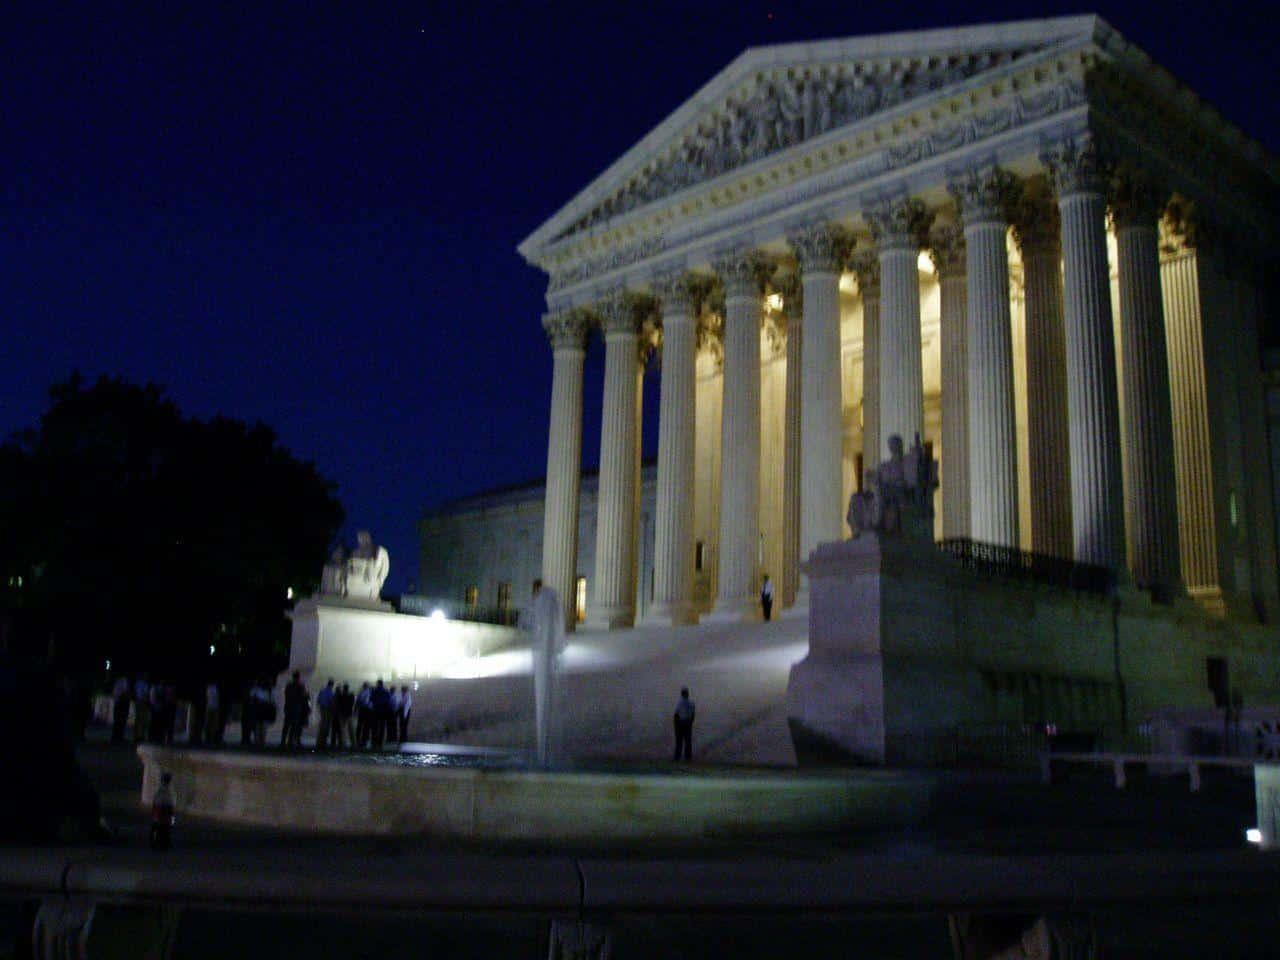 Will you be ready when #SCOTUS approves #DACA #DAPA?